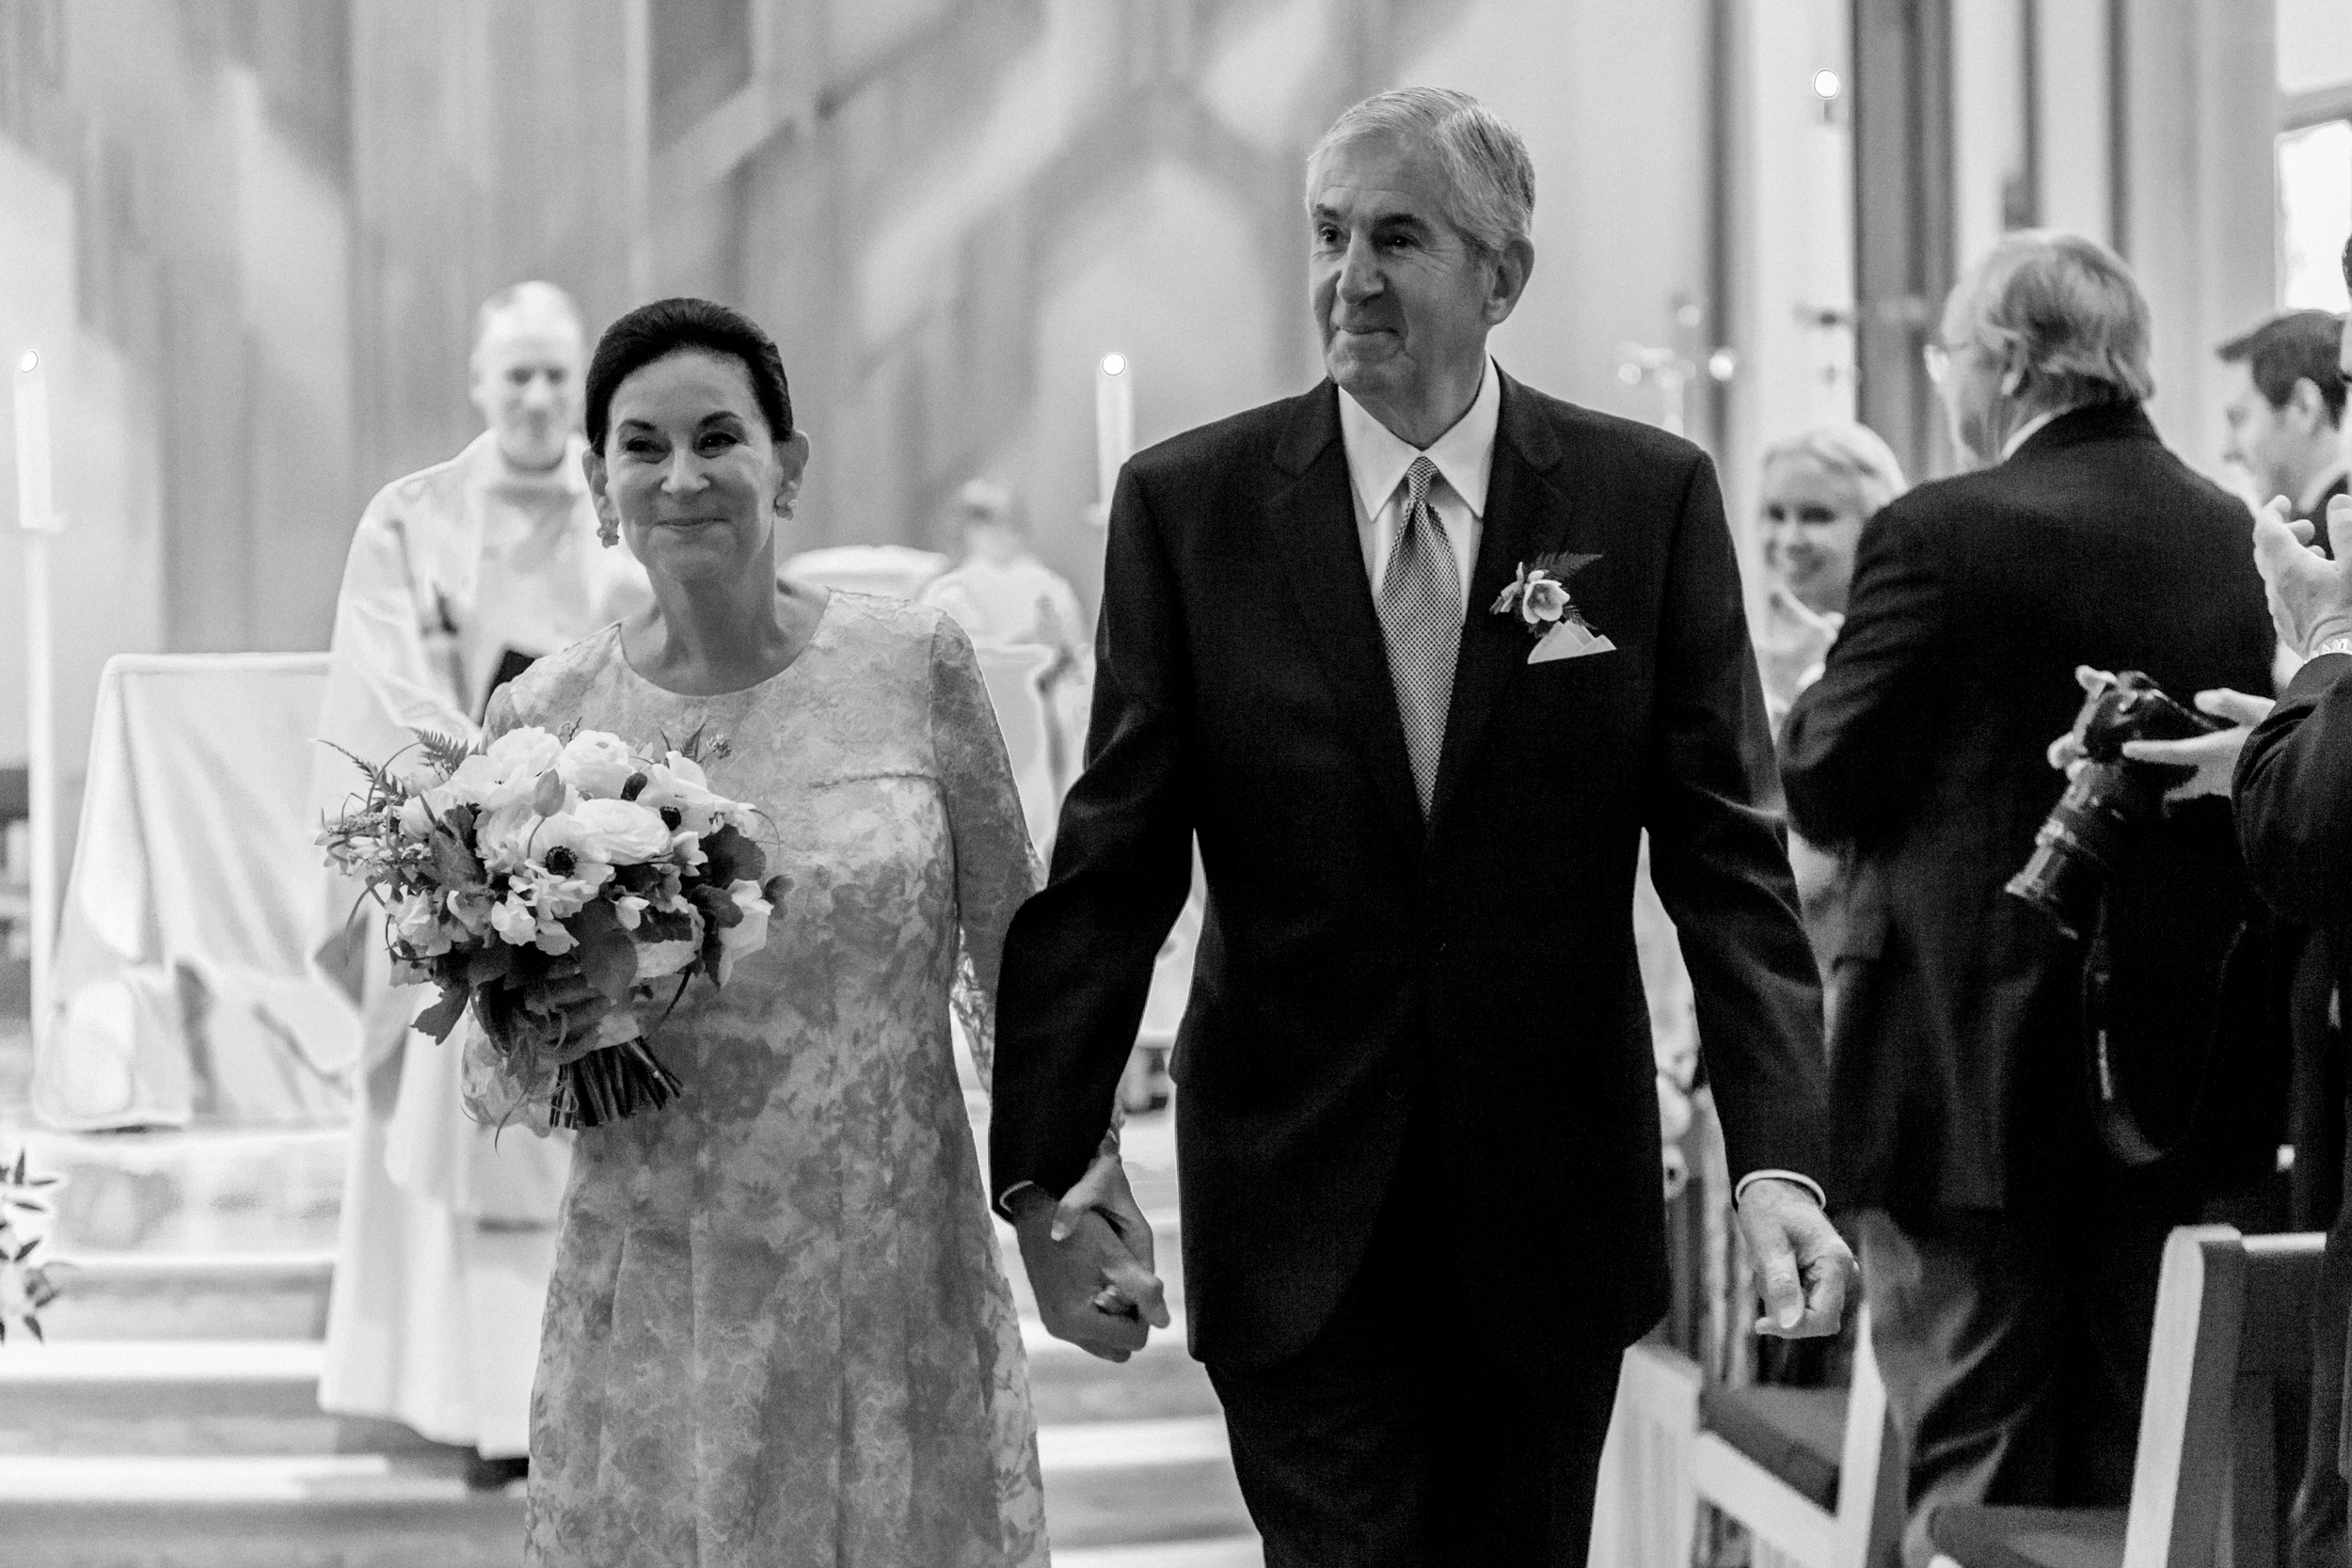 032 - bride & groom recessional.jpg